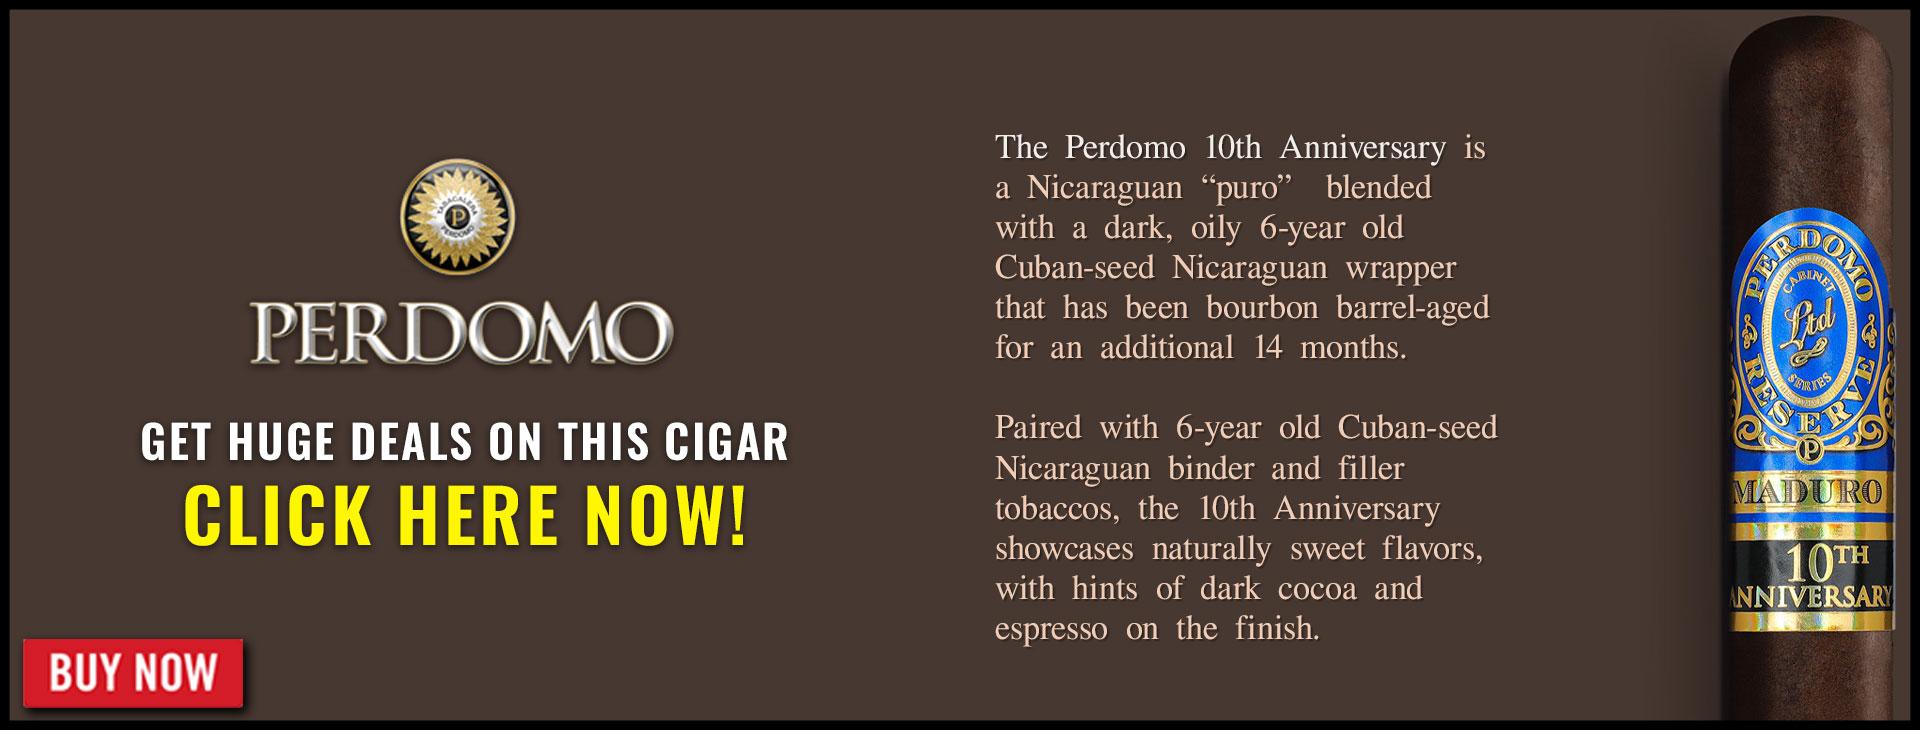 perdomo-10th-aniversary-2021-banner.jpg